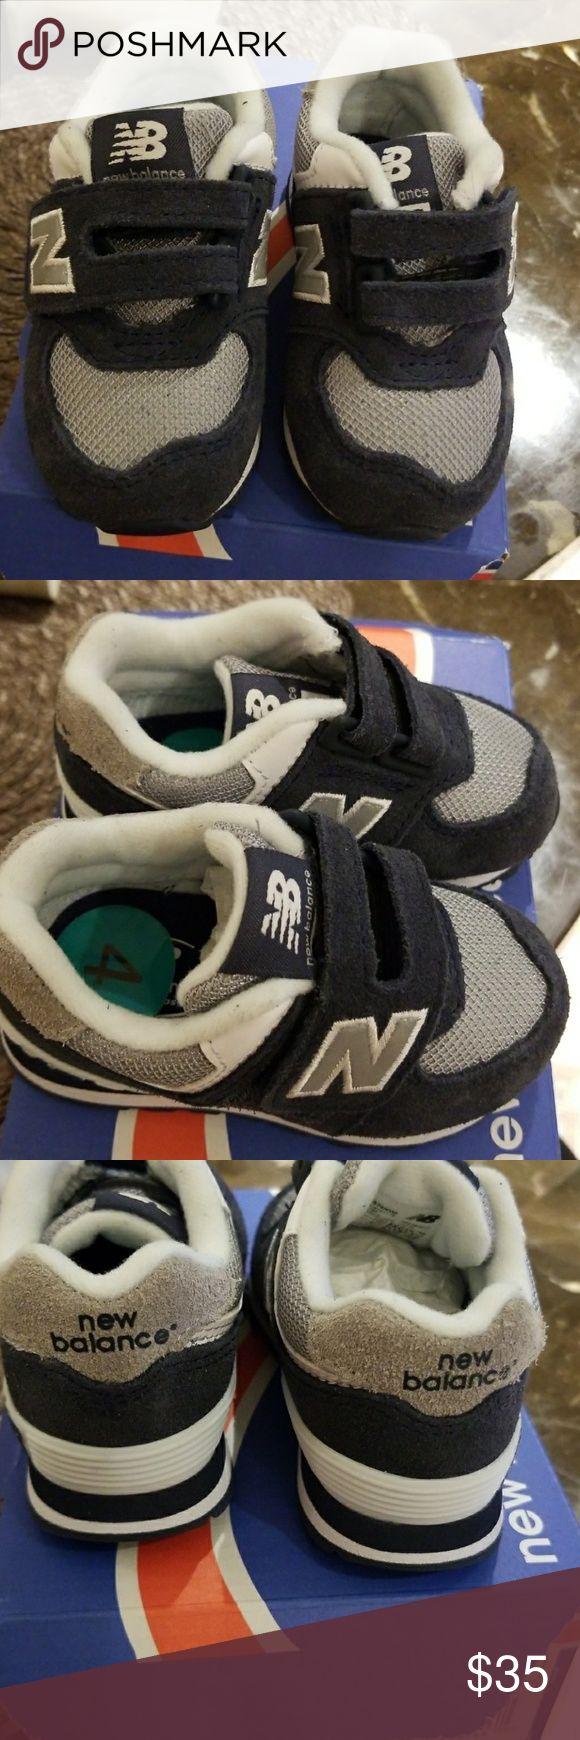 Final Sale Infant New Balance 574 Nwb Blue & Grey New Balance size 4....no lace sneakers New Balance Shoes Baby & Walker